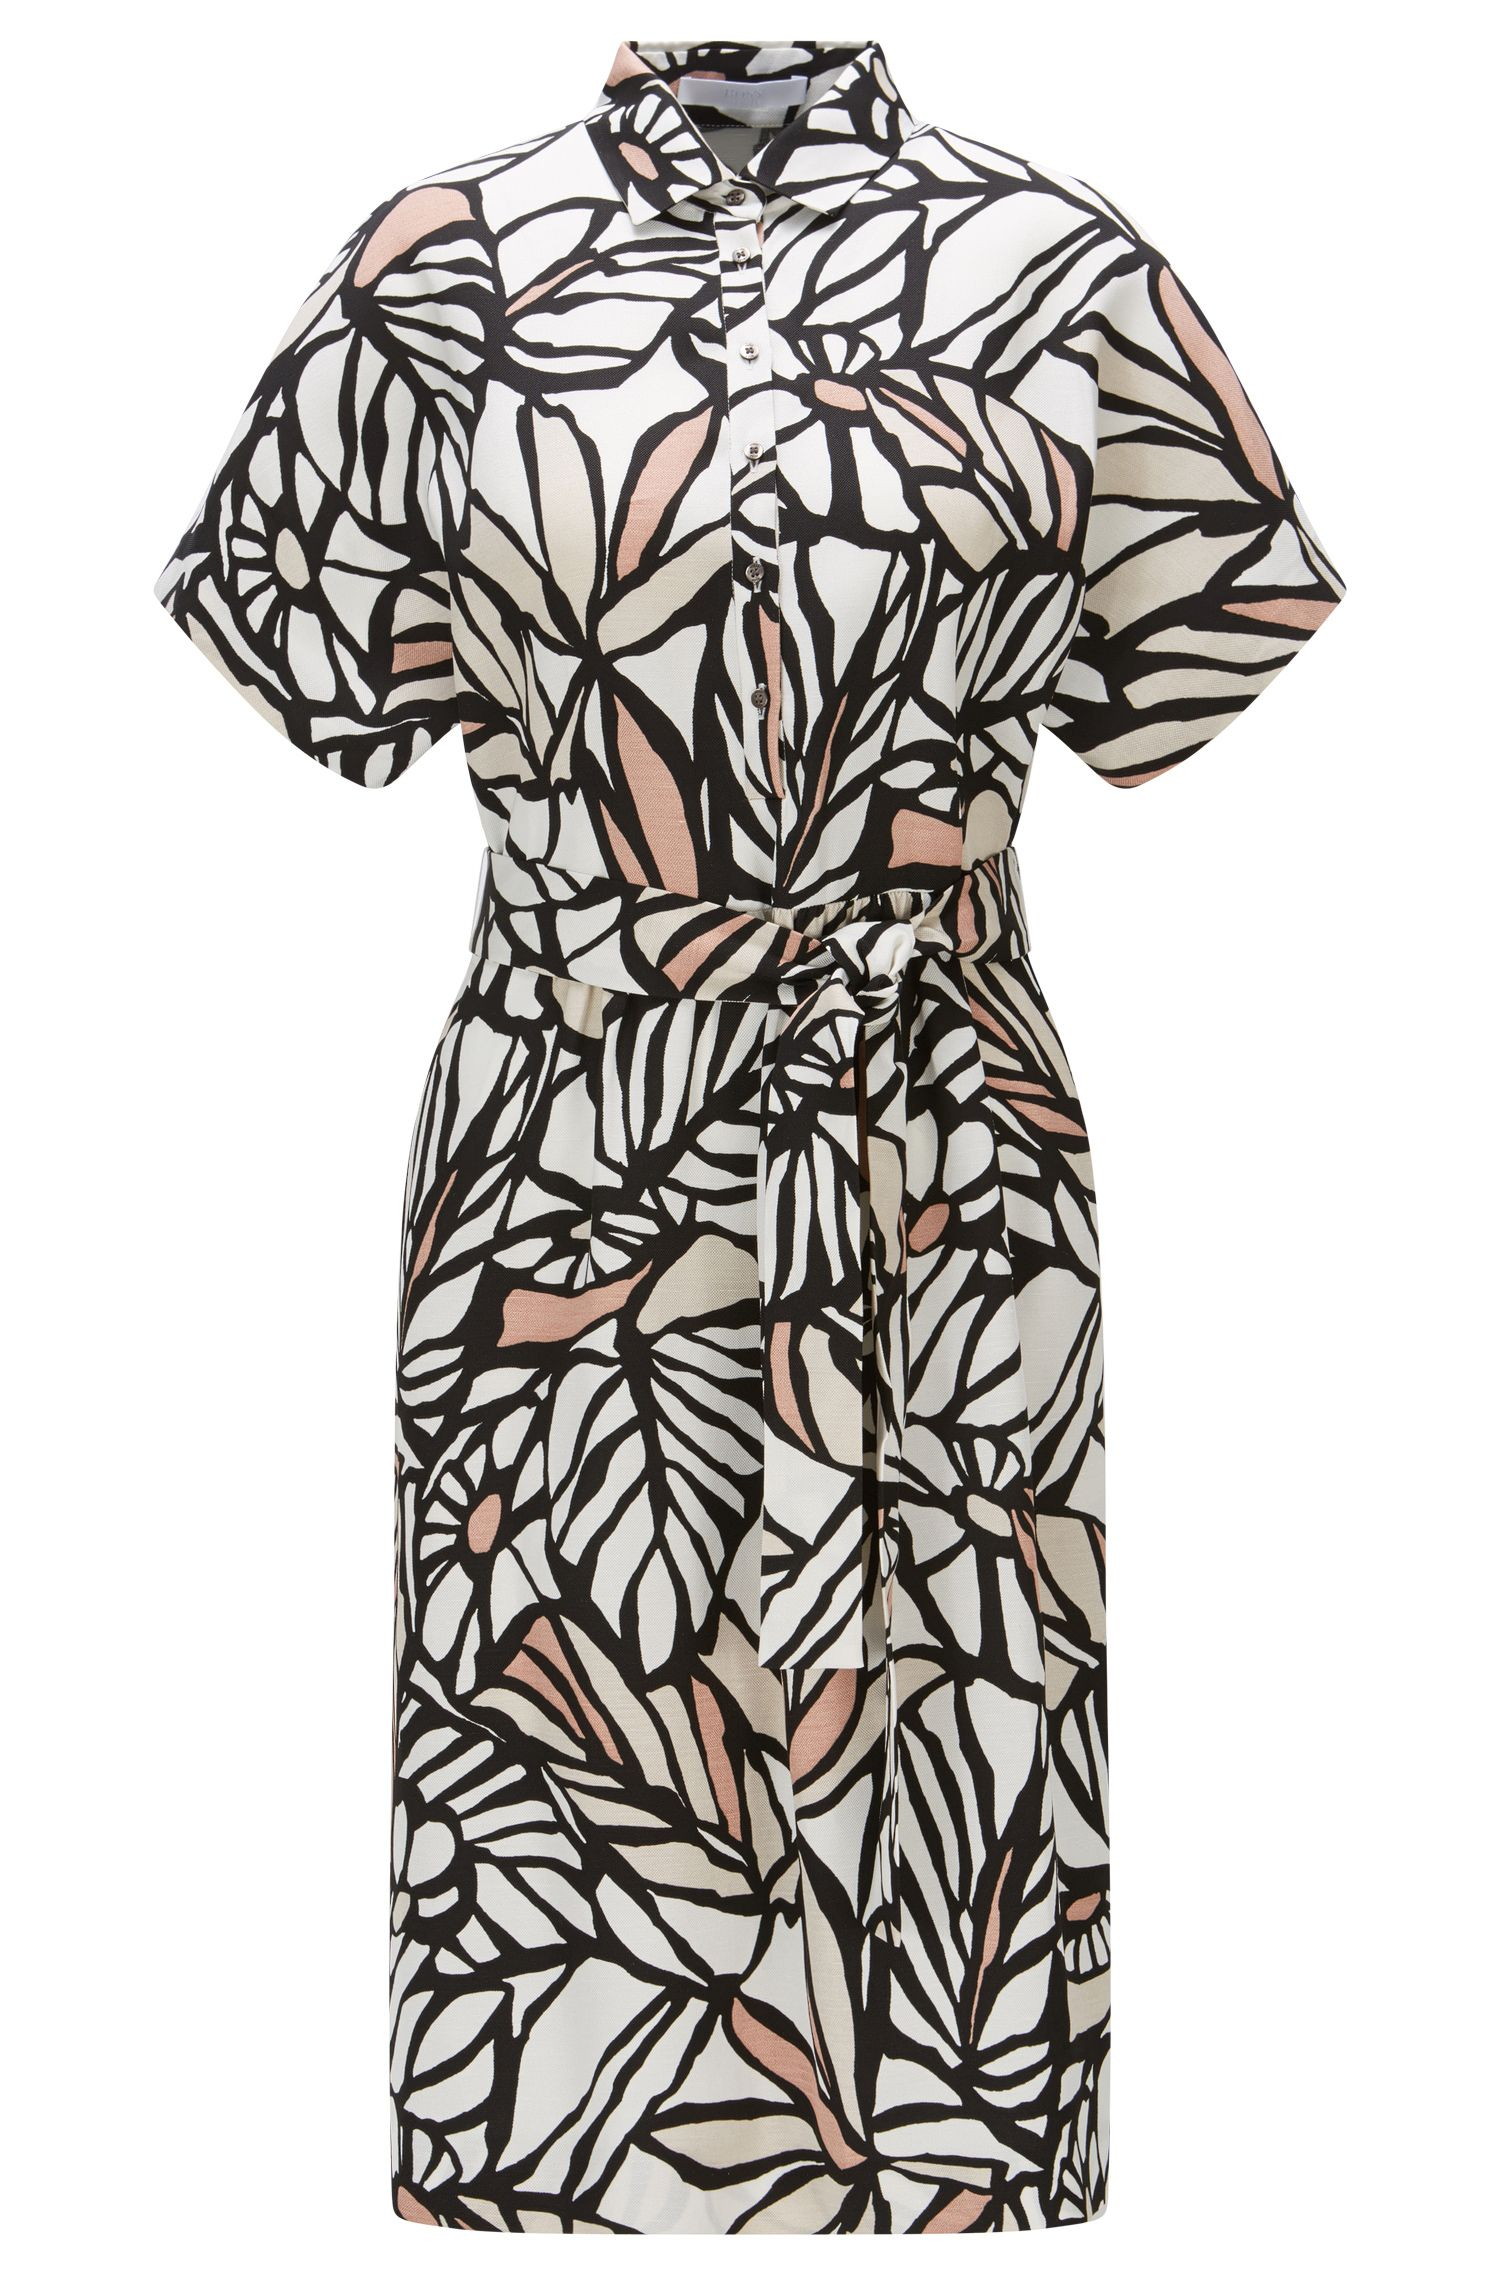 'Holera' | Printed Viscose Linen Shirt Dress